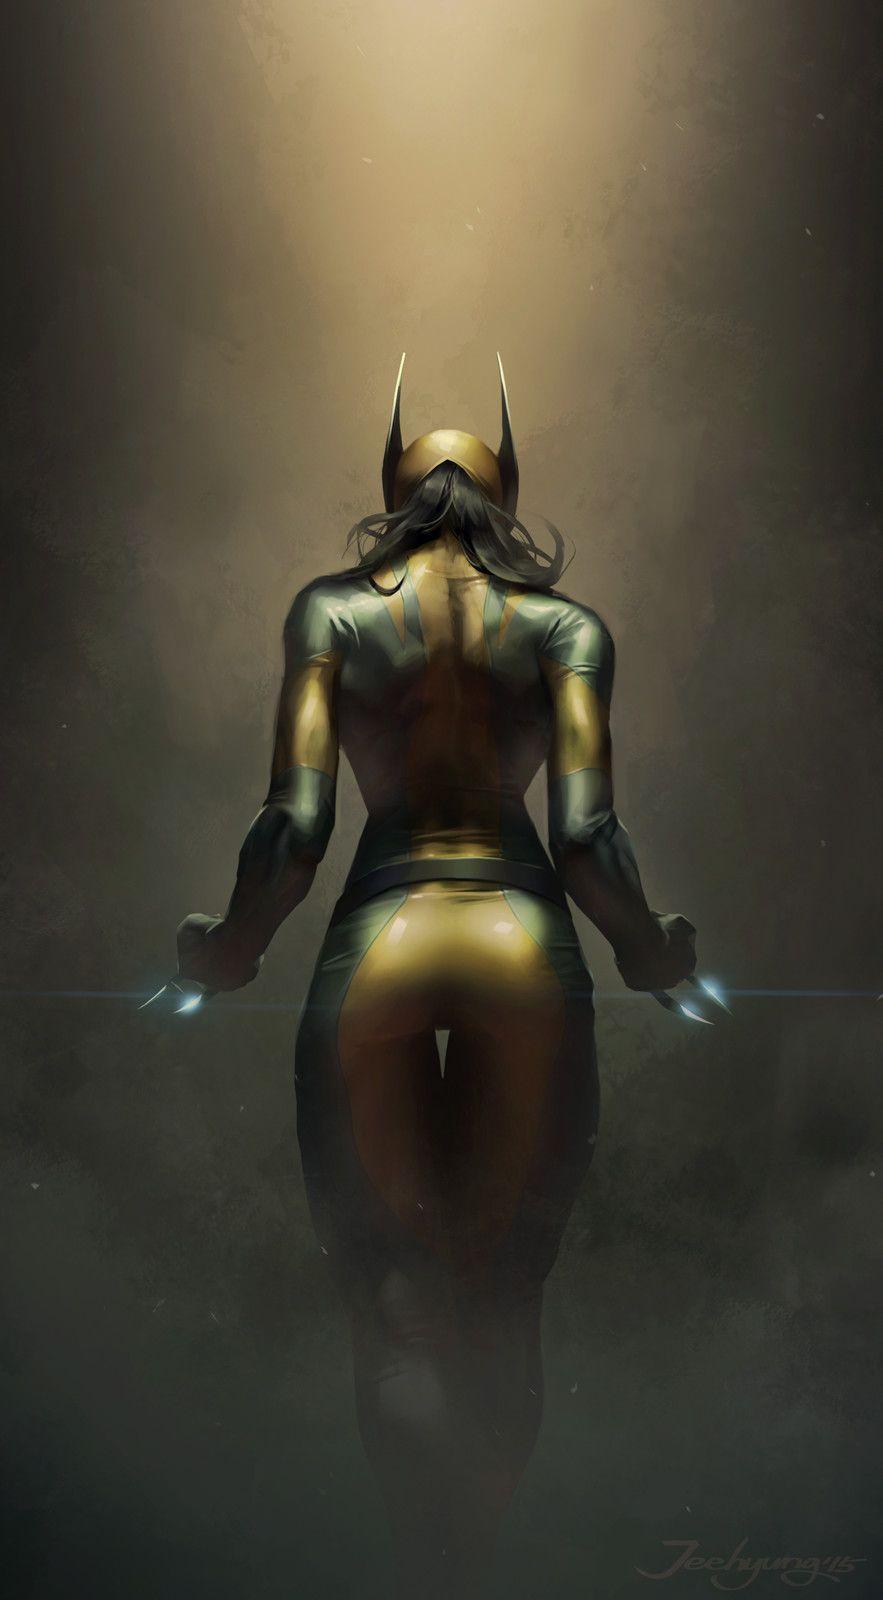 X-23, JeeHyung lee on ArtStation at https://www.artstation.com/artwork/x-23-7